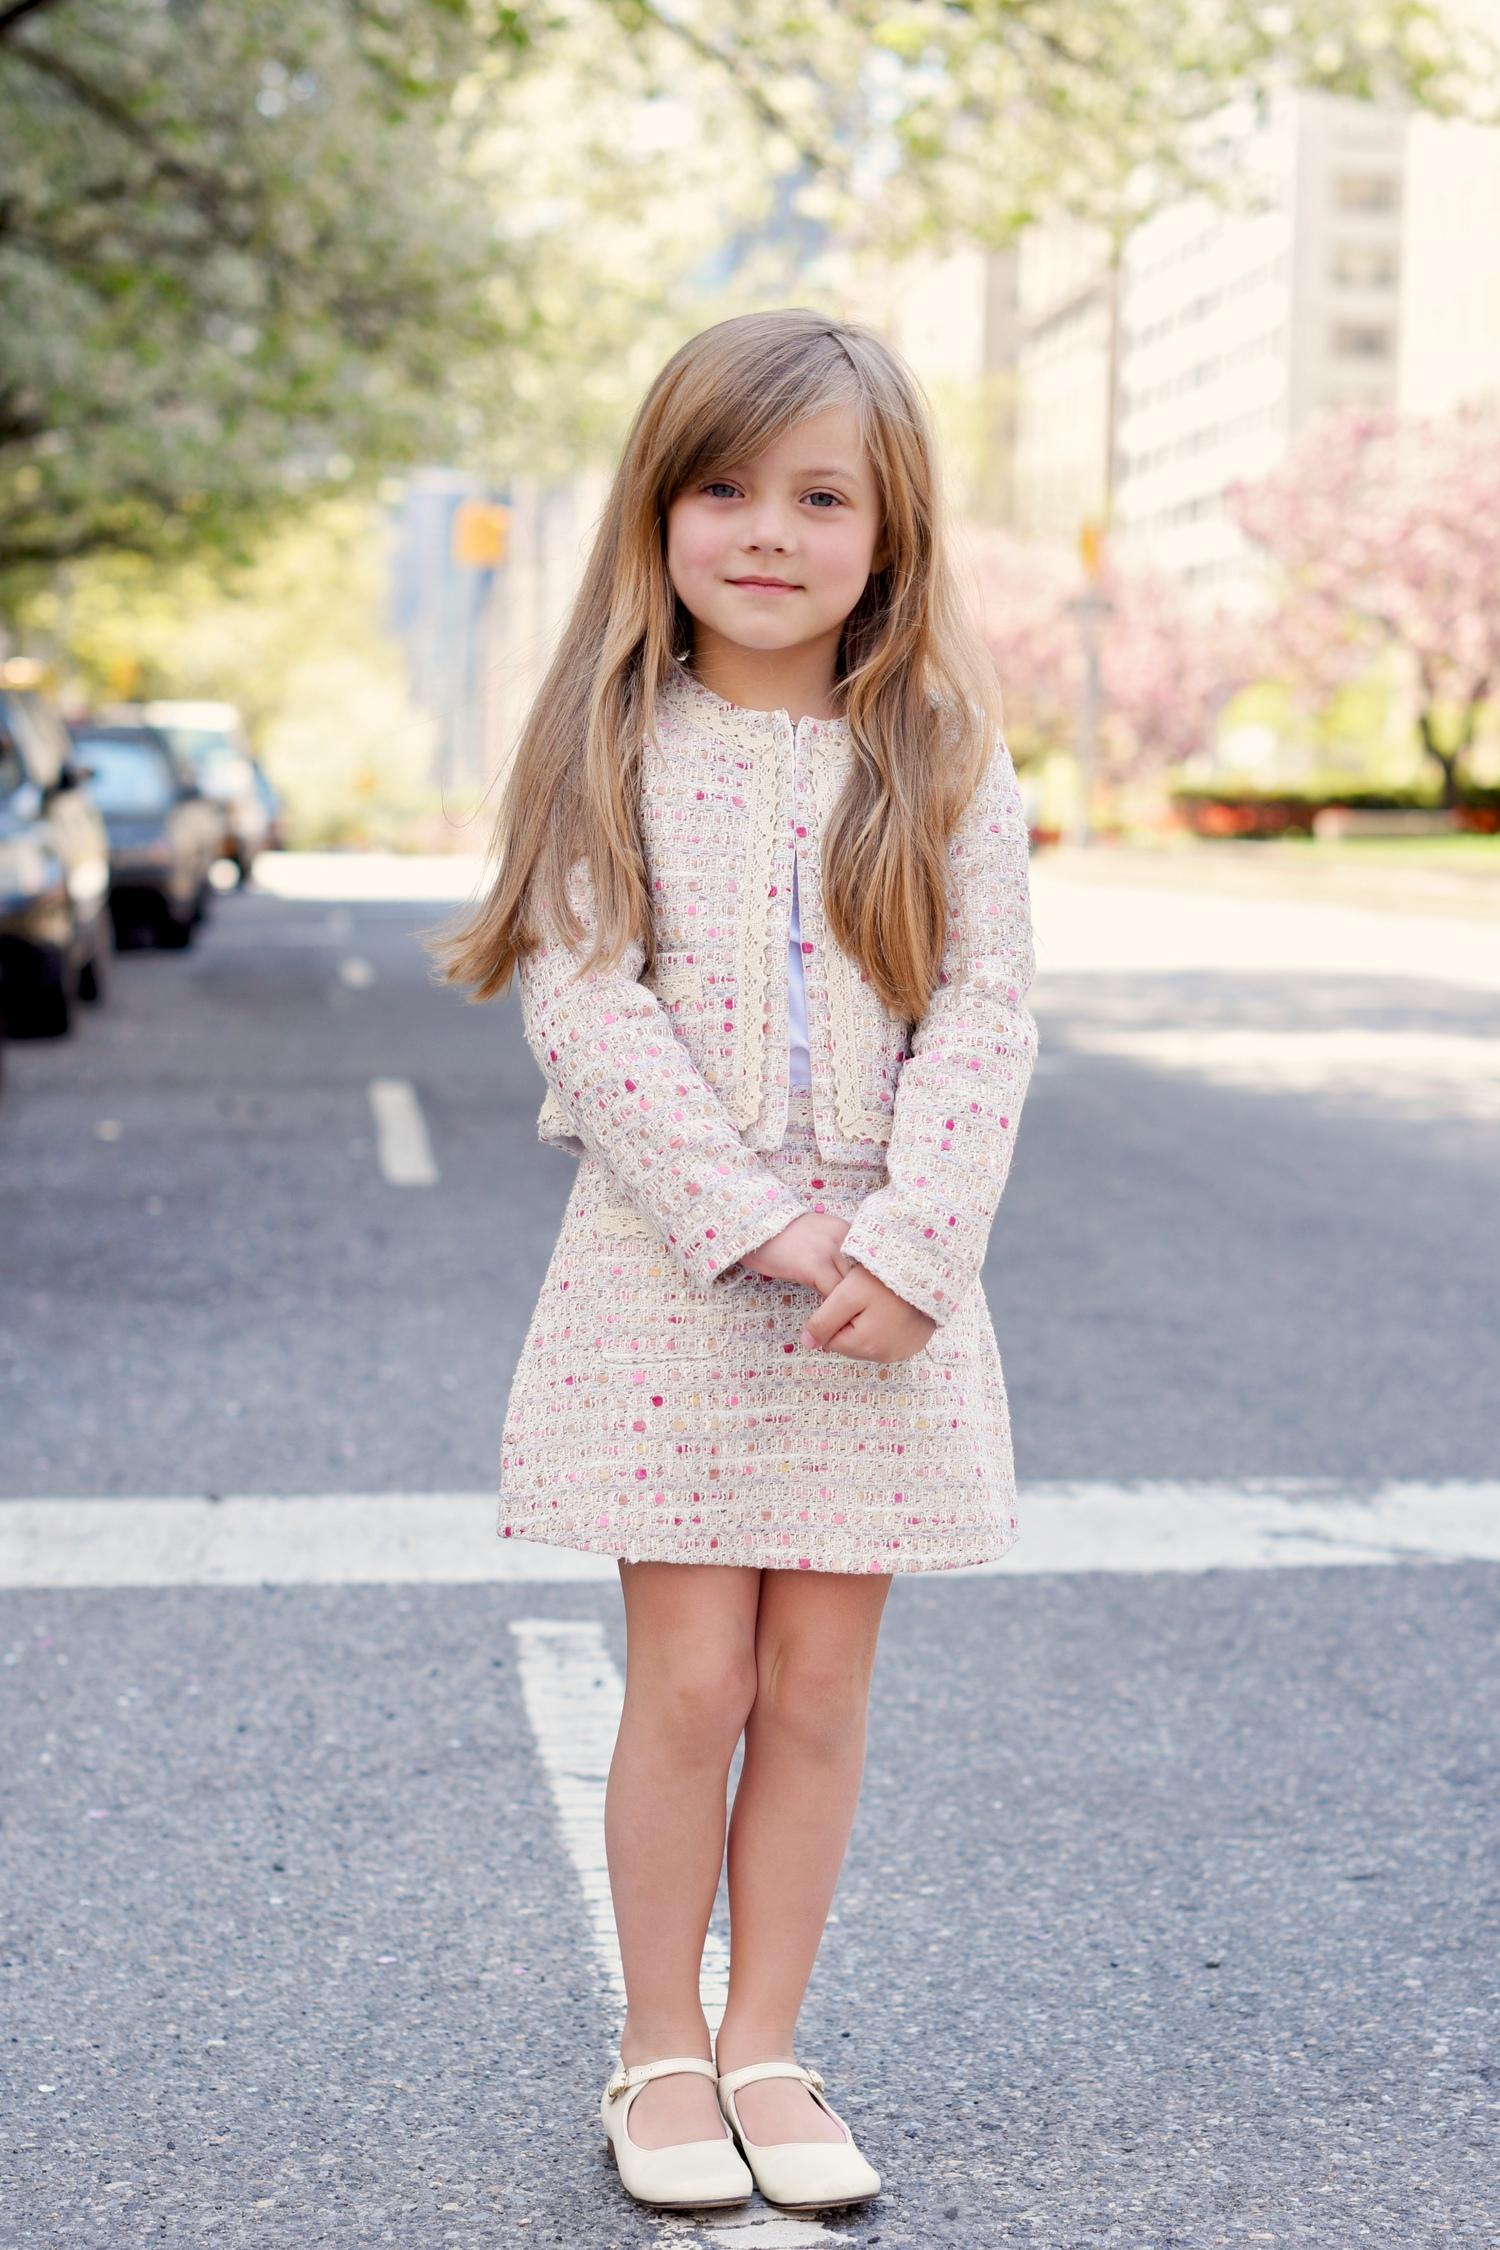 Enfant+Street+Style+by+Gina+Kim+Photography-31.jpeg